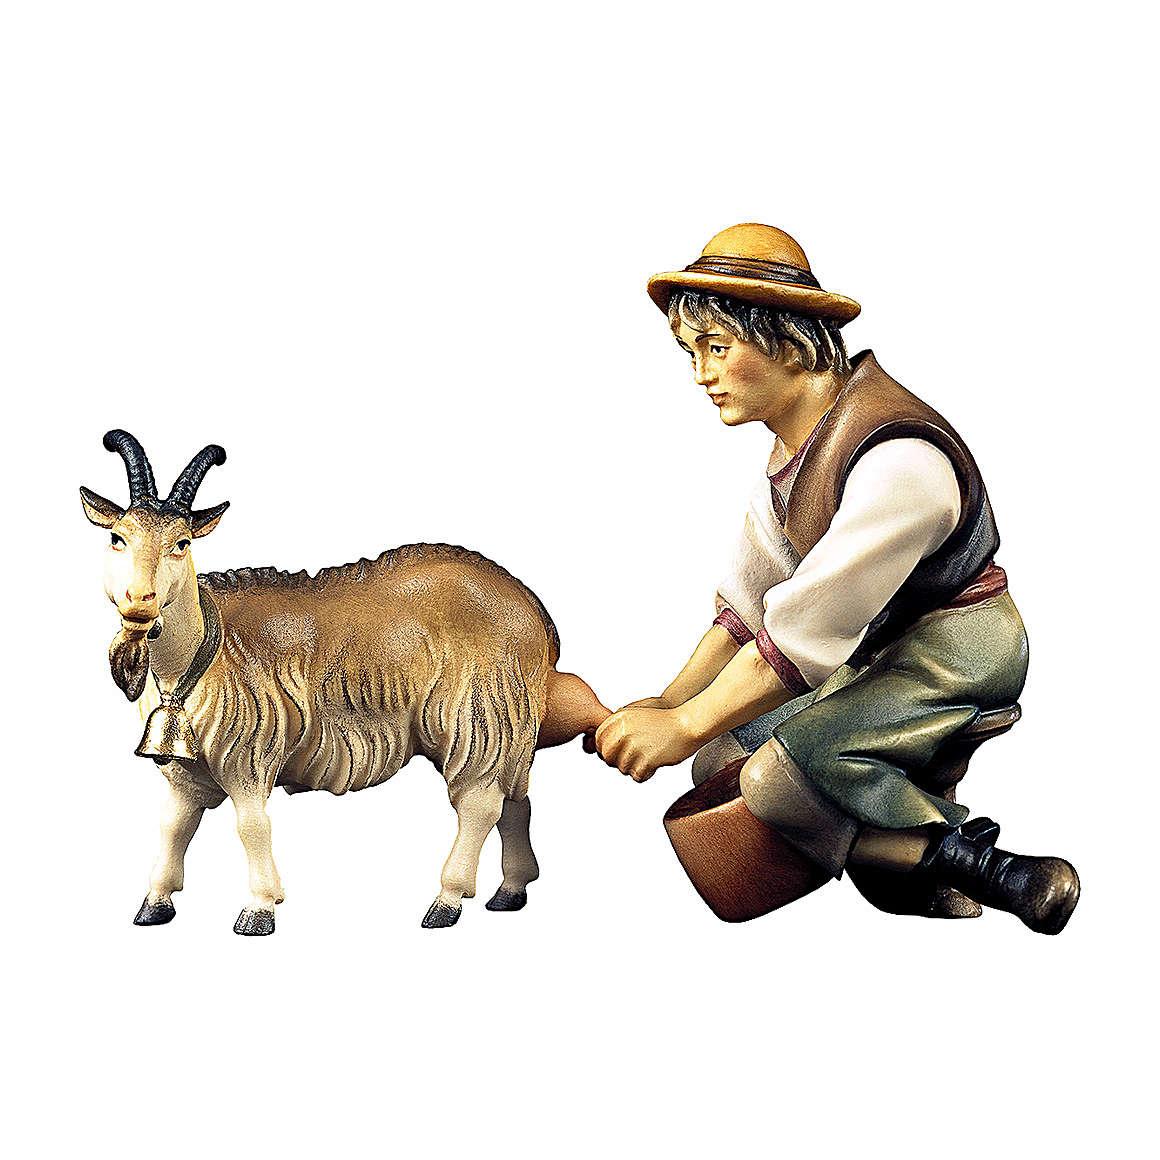 Pastore che munge una capra presepe Original legno dipinto in Valgardena 10 cm 4